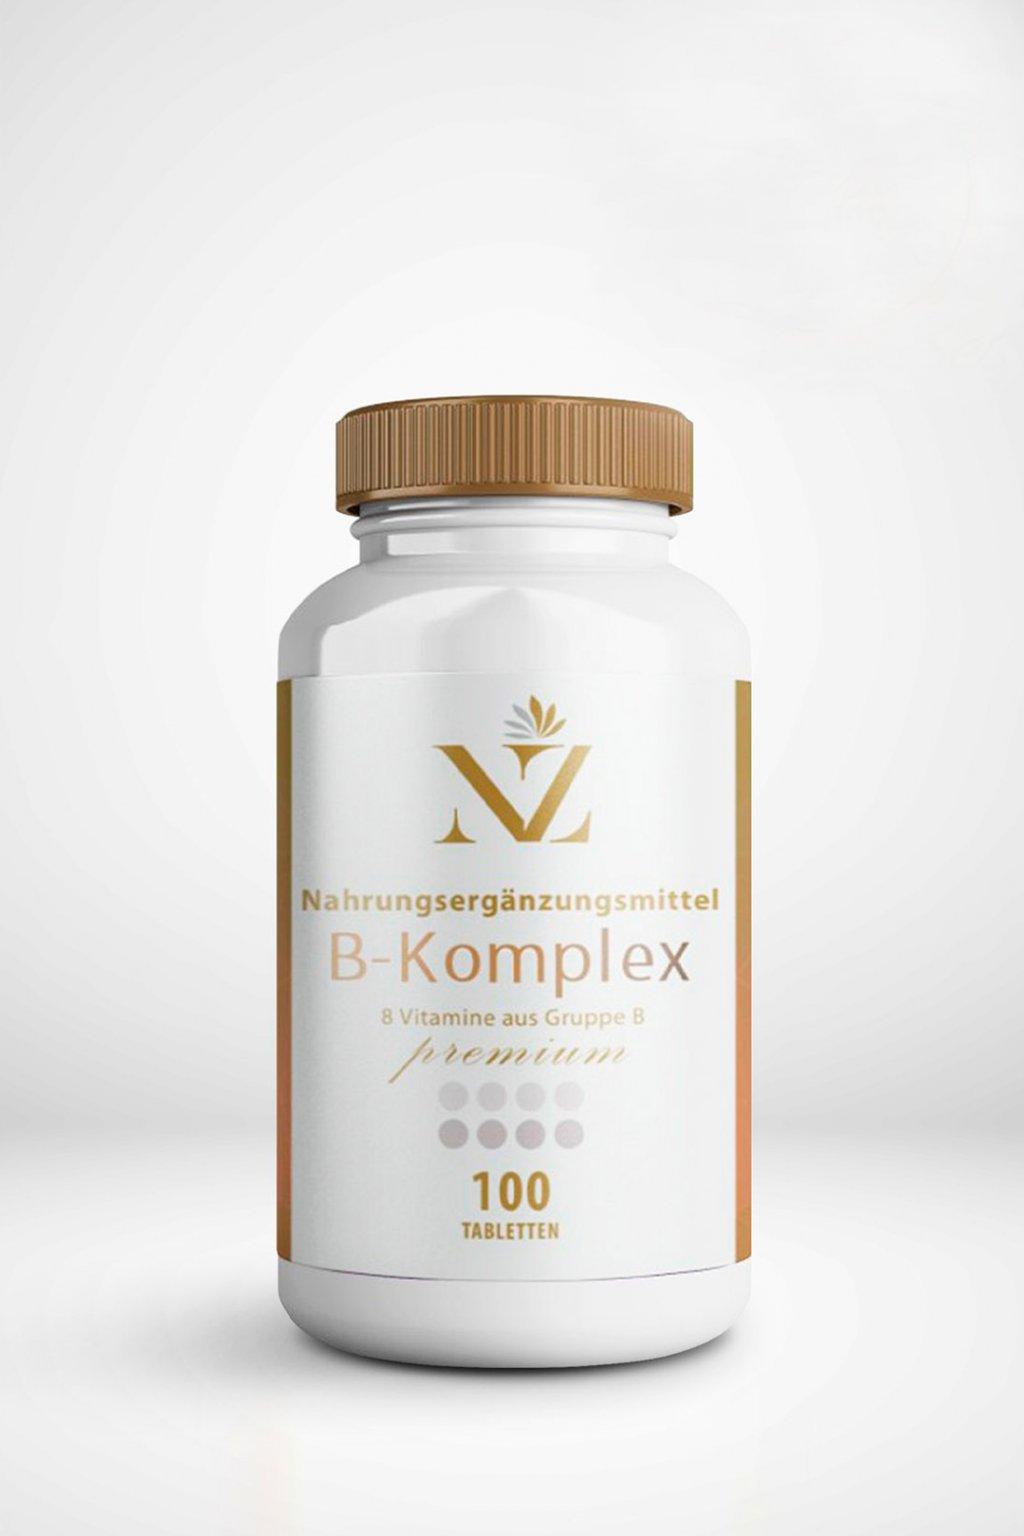 B Komplex immunitas naturalzen